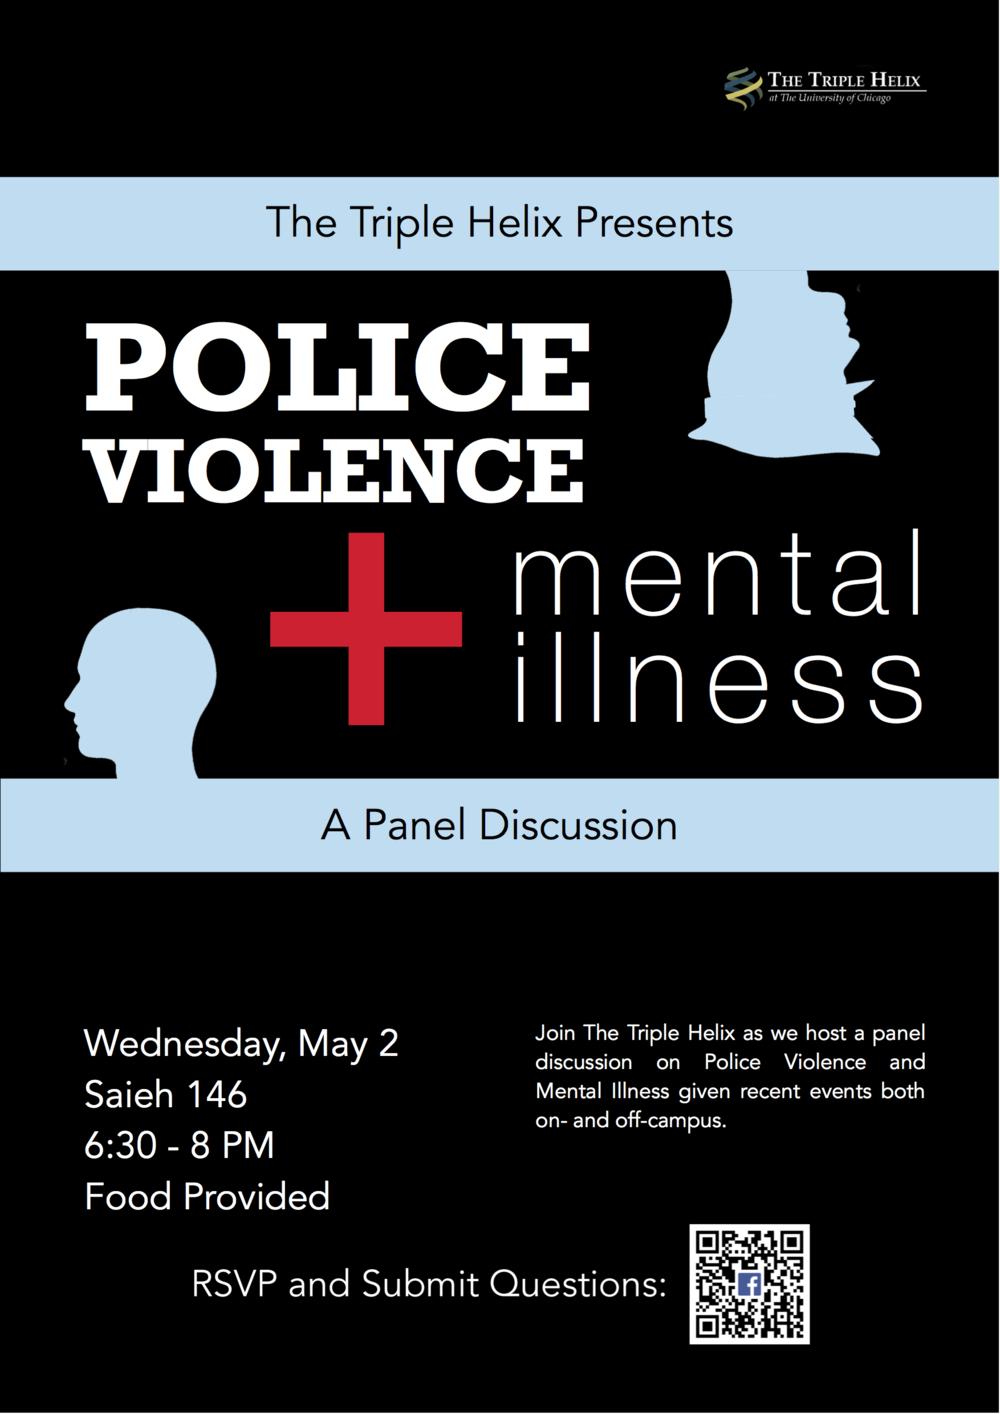 Police Violence and Mental Illness